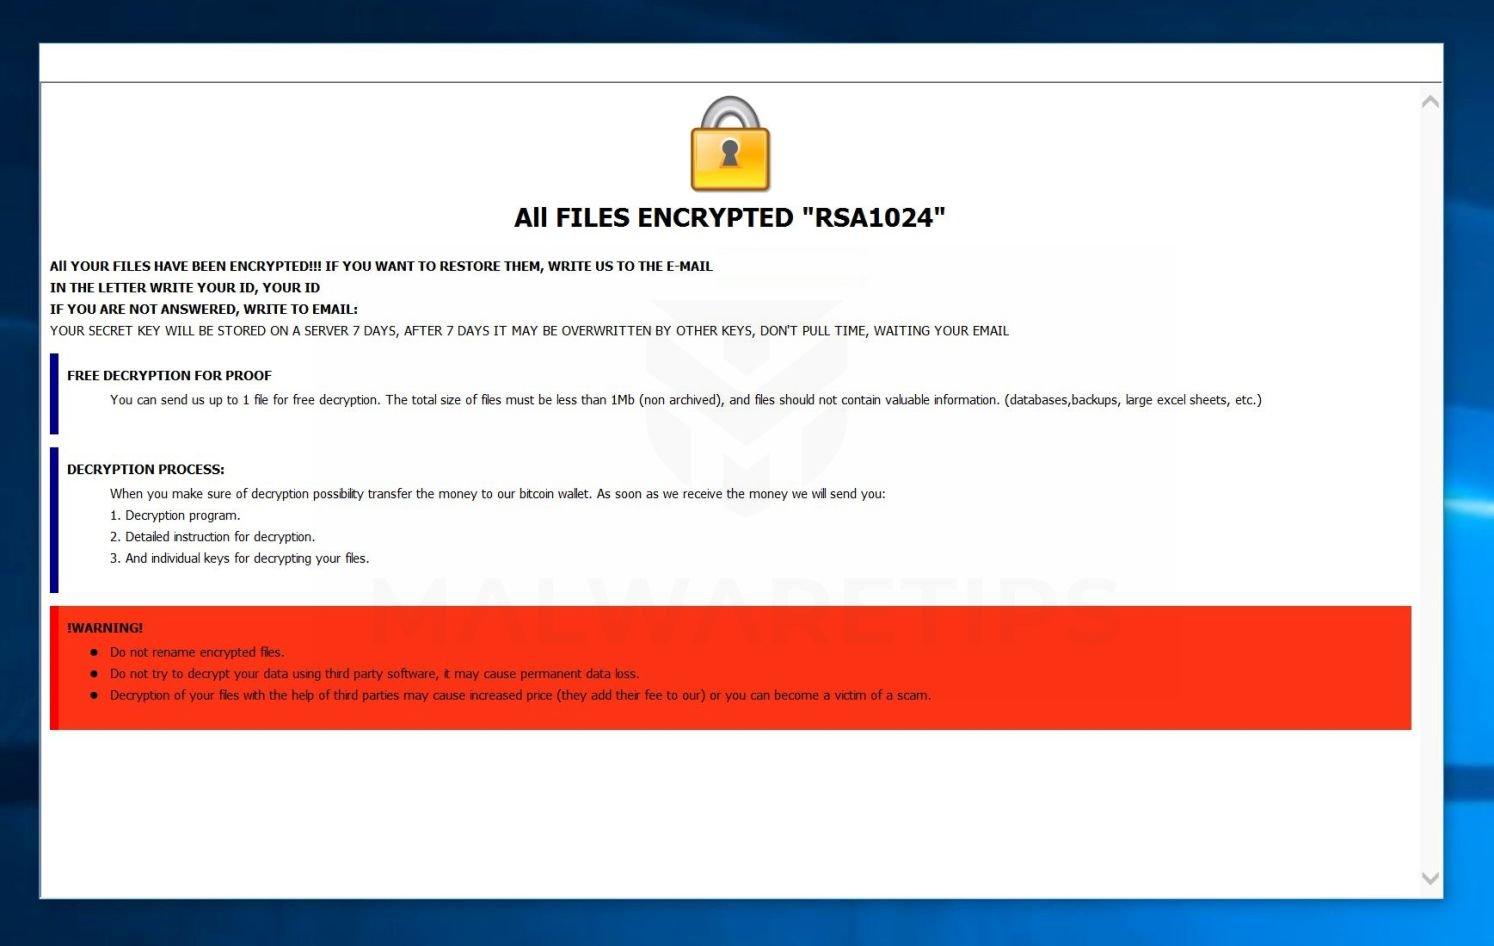 Image: [Btcdecoding@qq.com].QBX ransomware